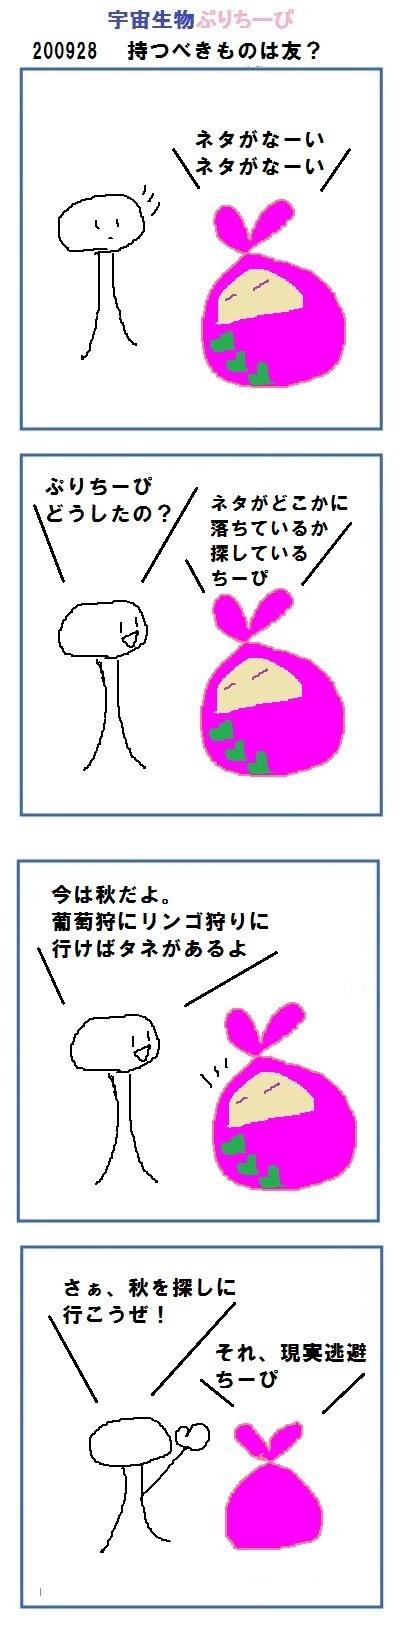 200928-pry.jpg